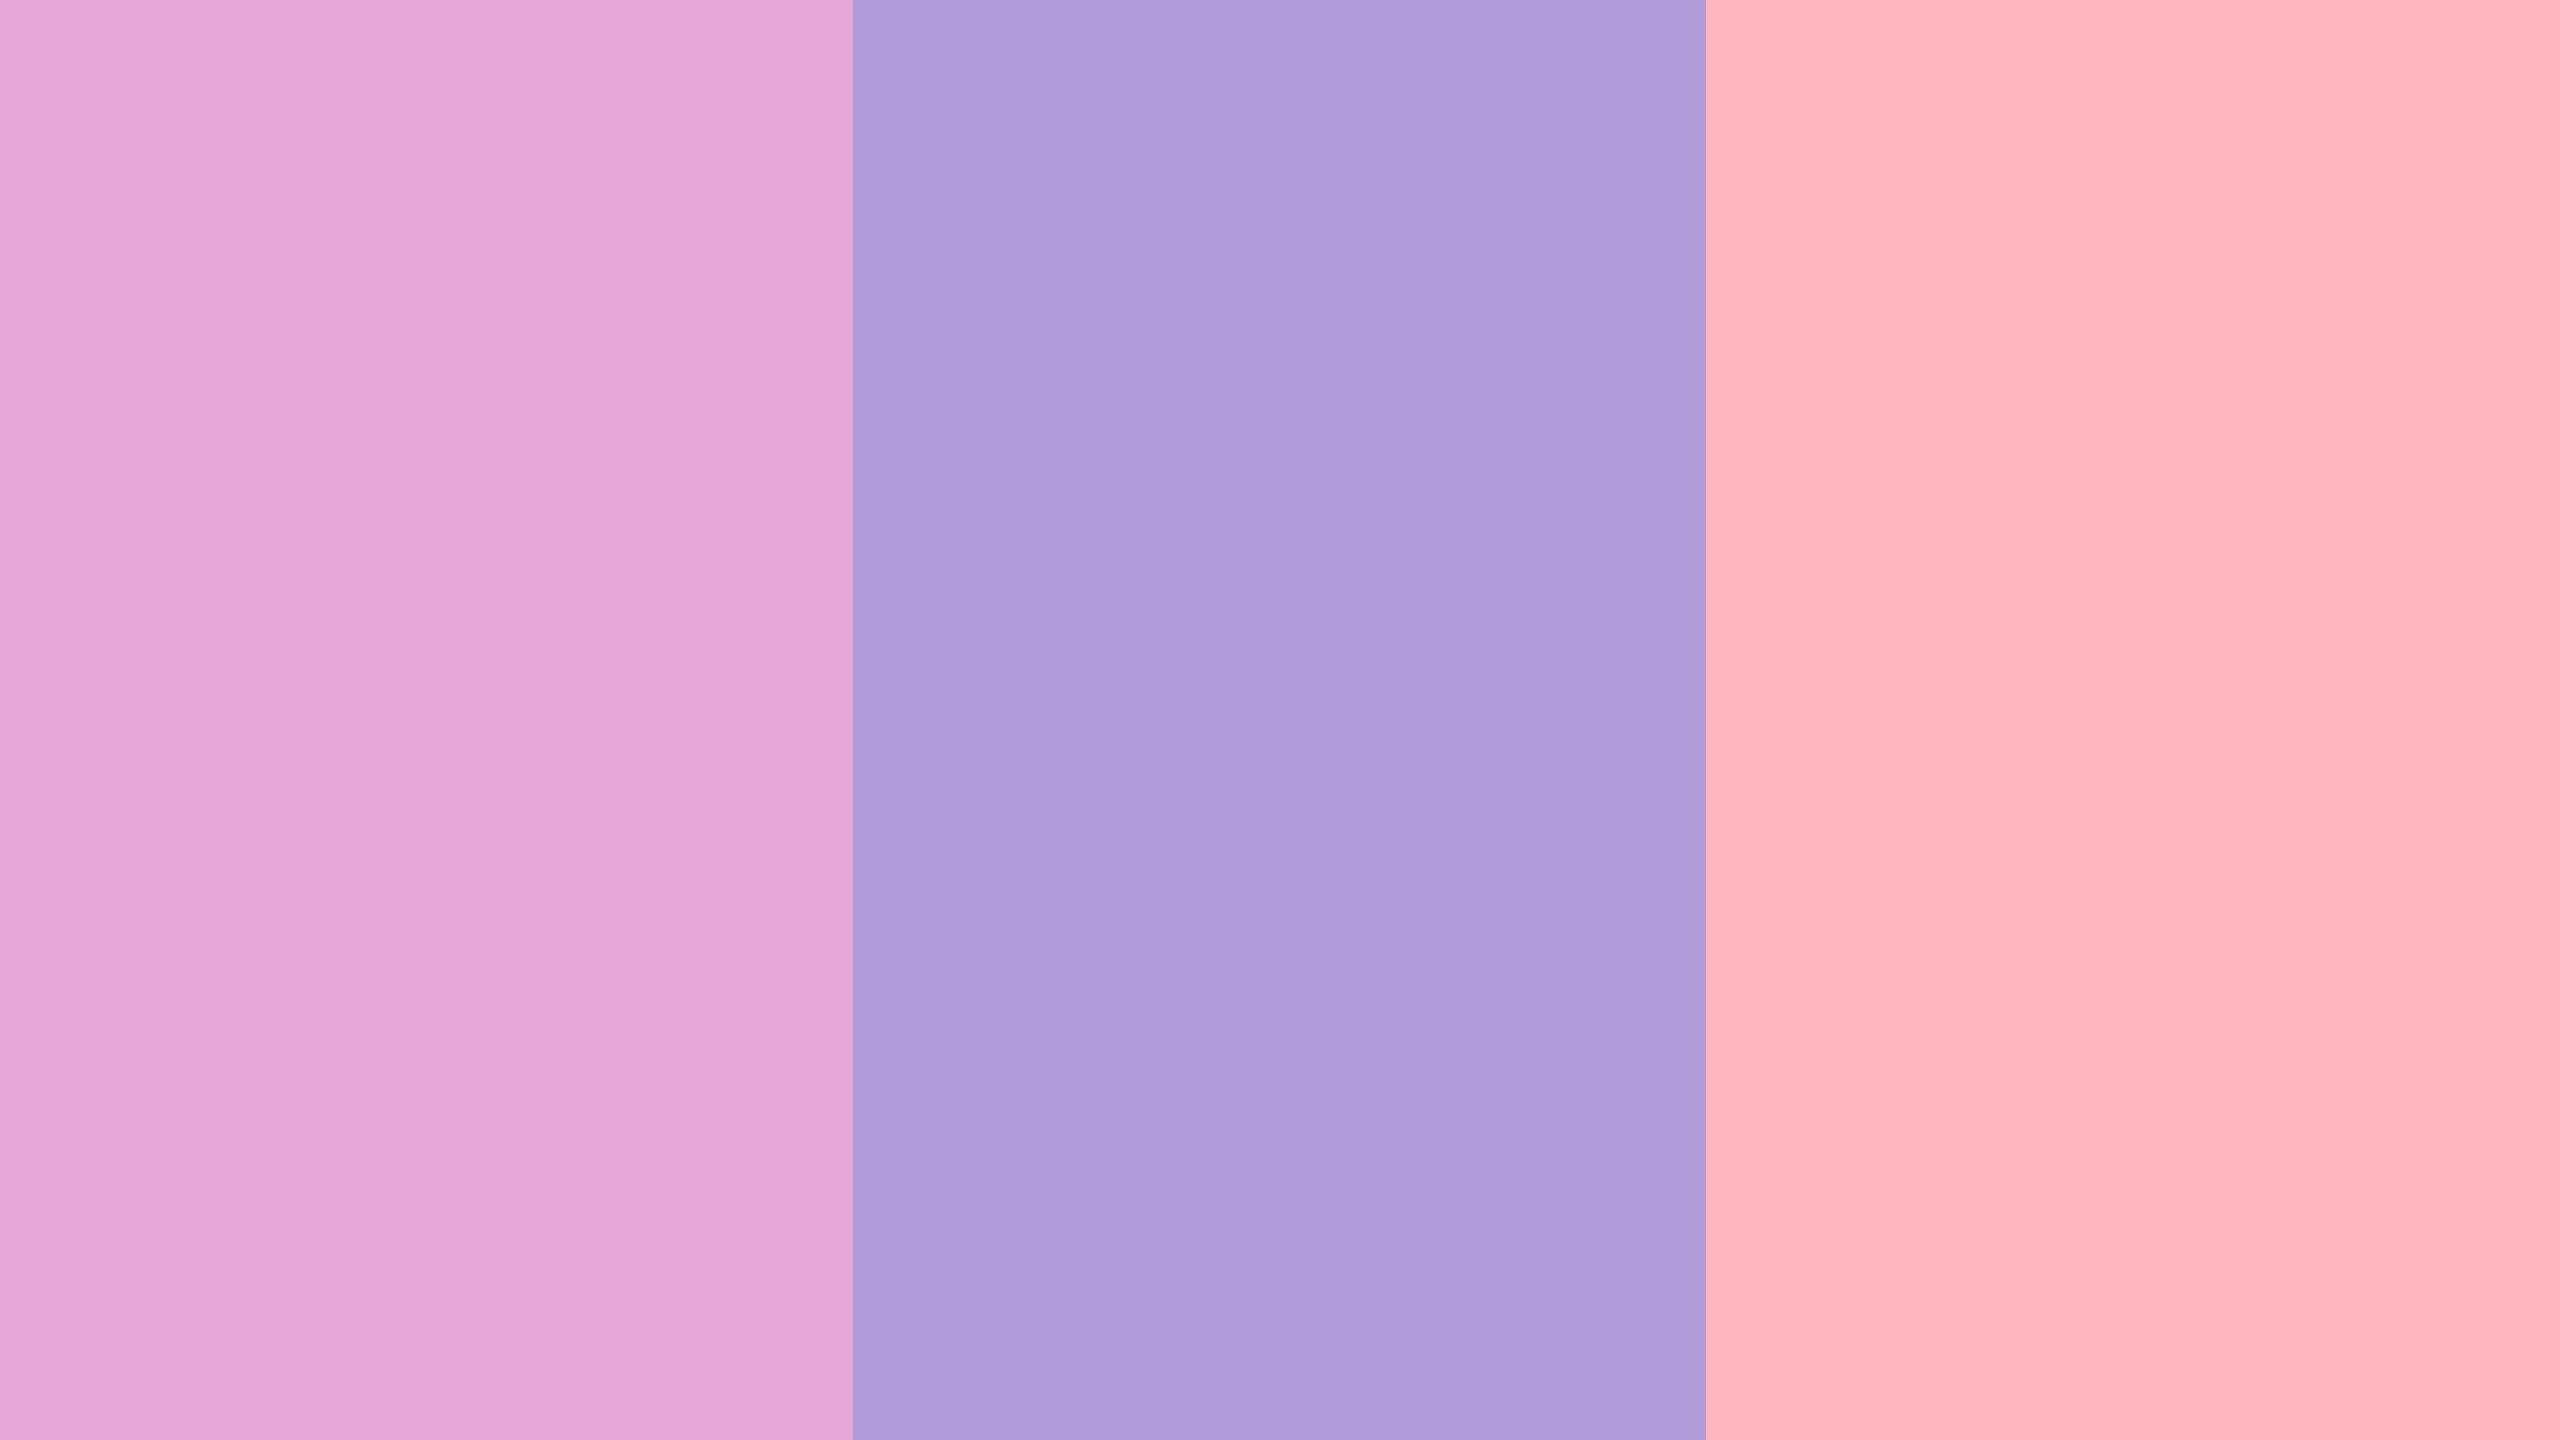 Pastel Pink Desktop Wallpapers - Wallpaper Cave